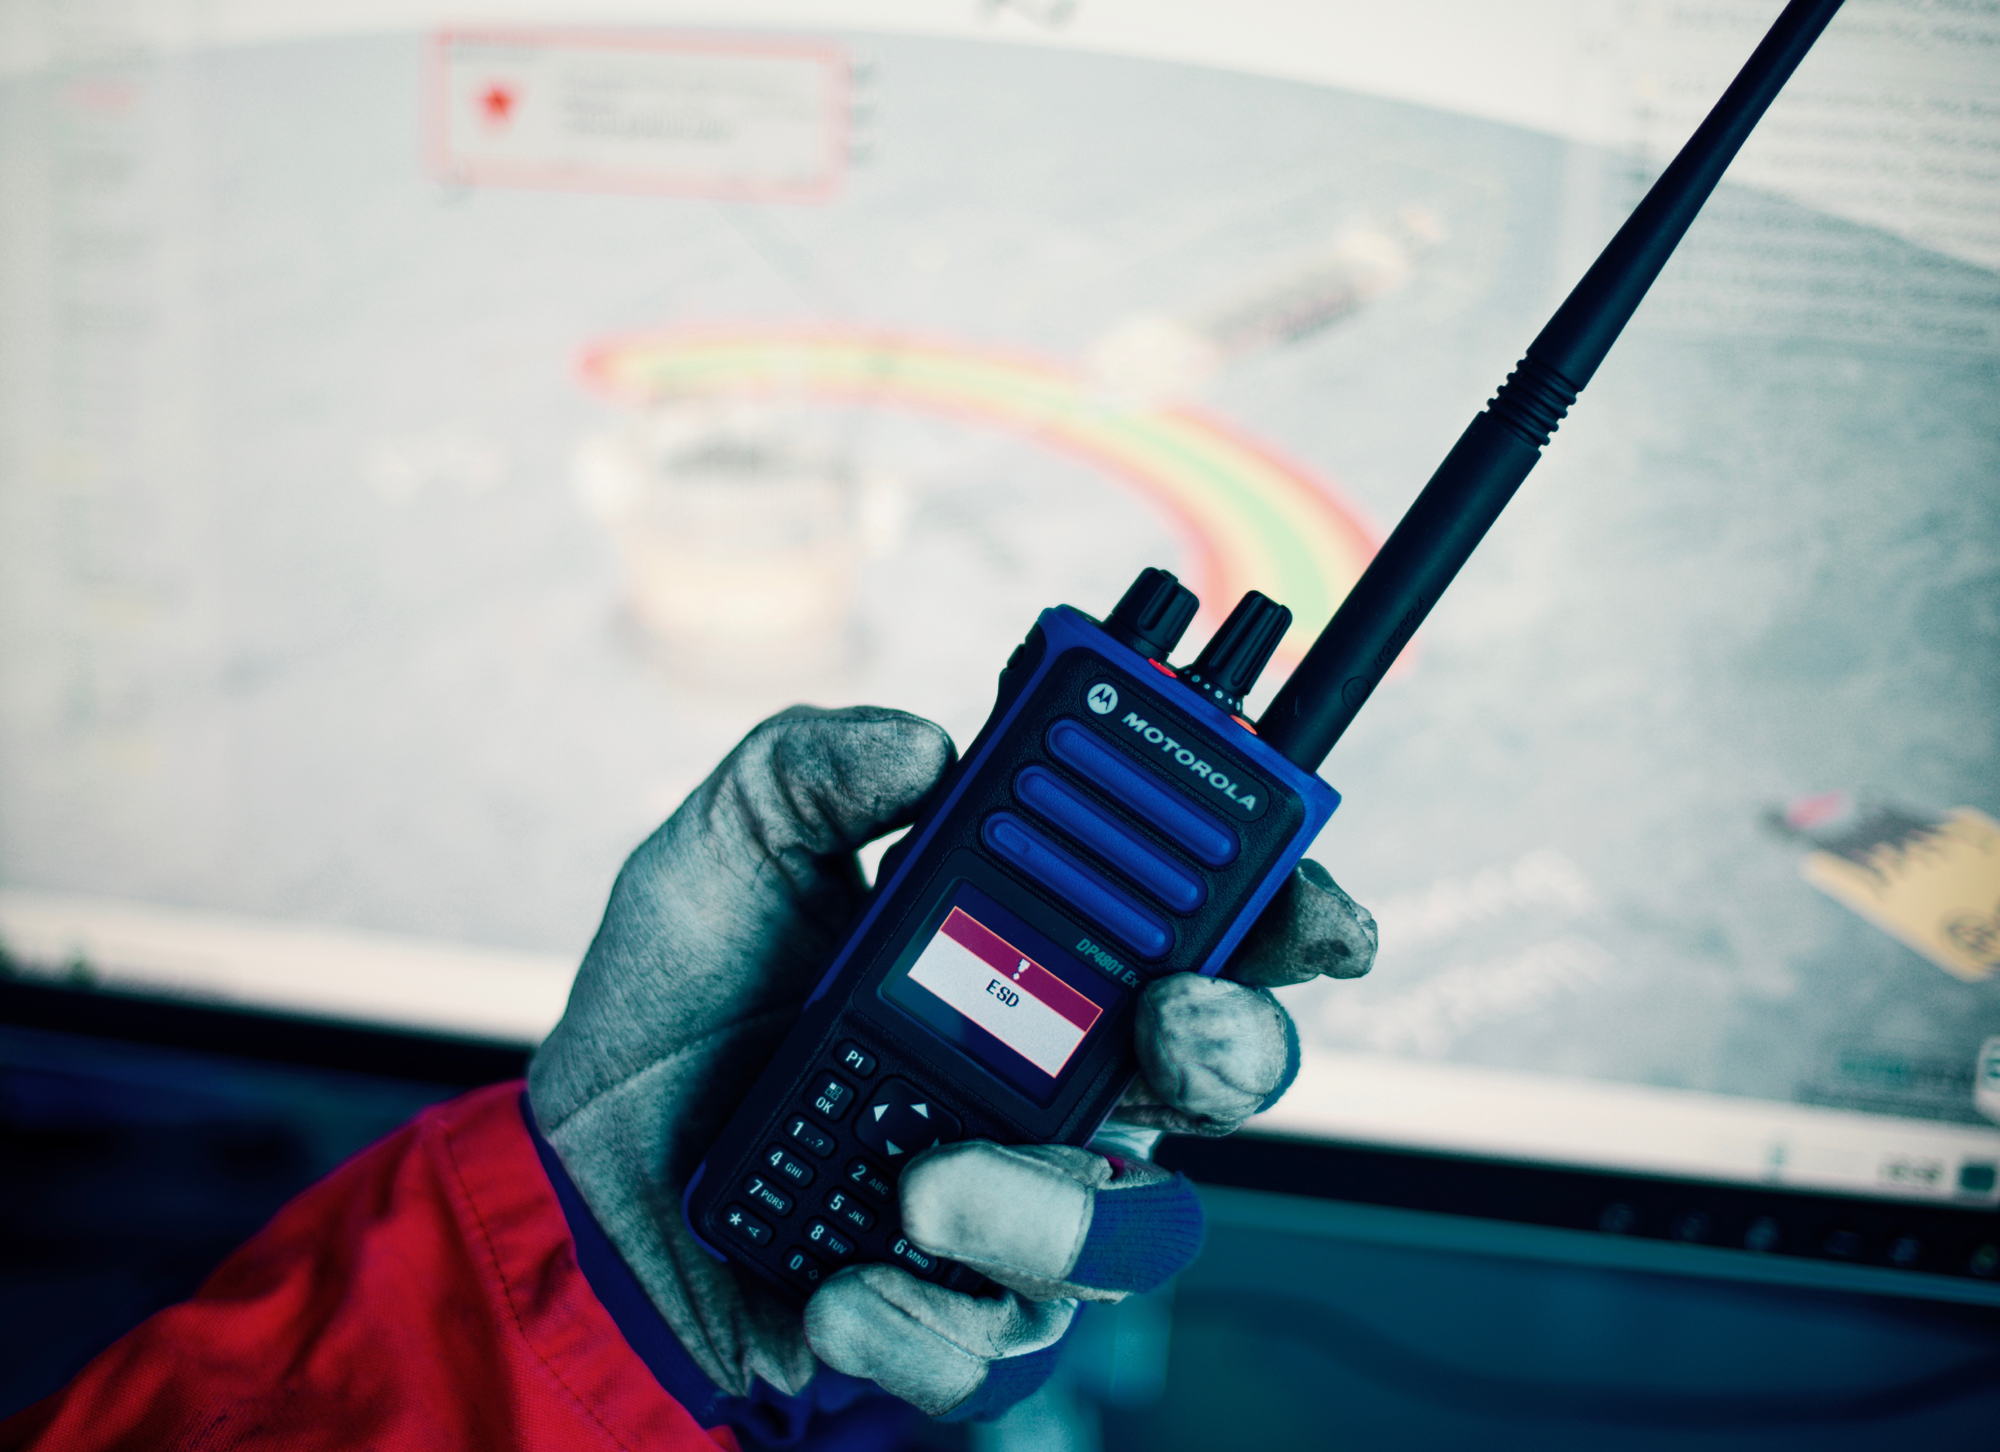 OMTS - Offloading Monitoring Telemetry System, Motorola Solutions